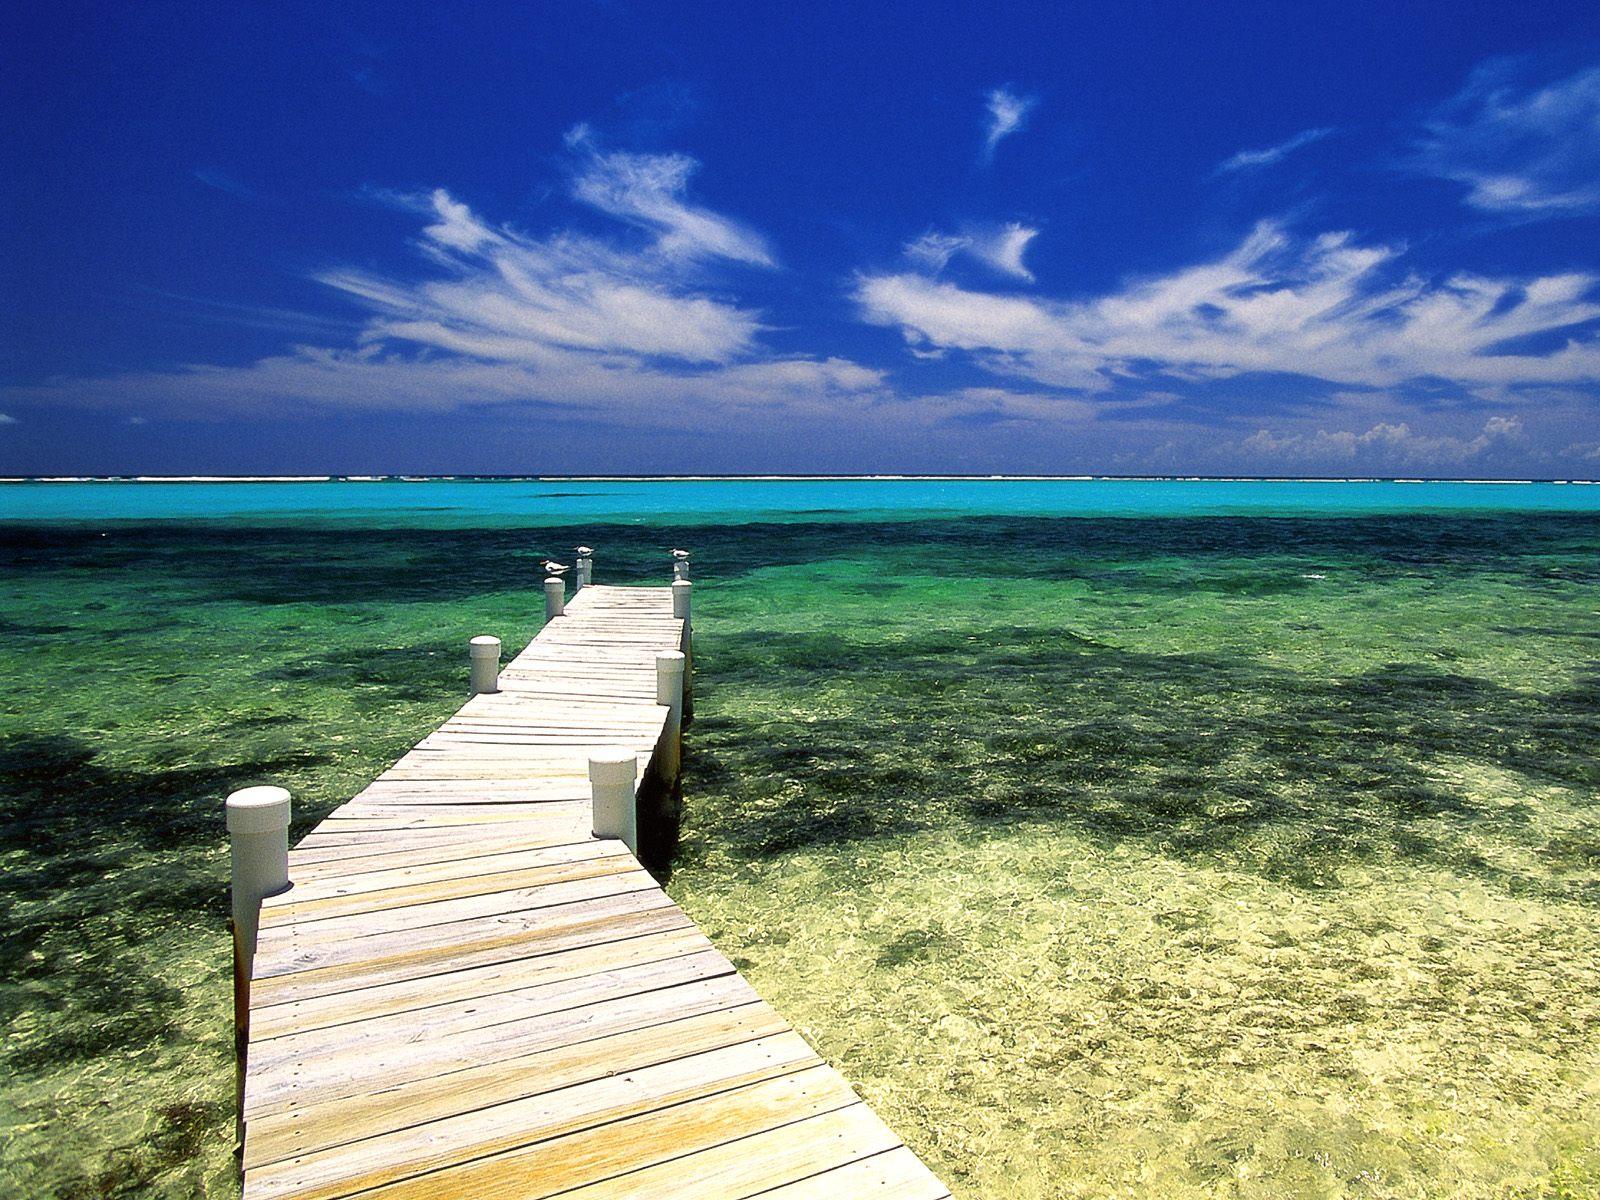 ... desktop wallpaper beach scenes which is under the beach wallpapers